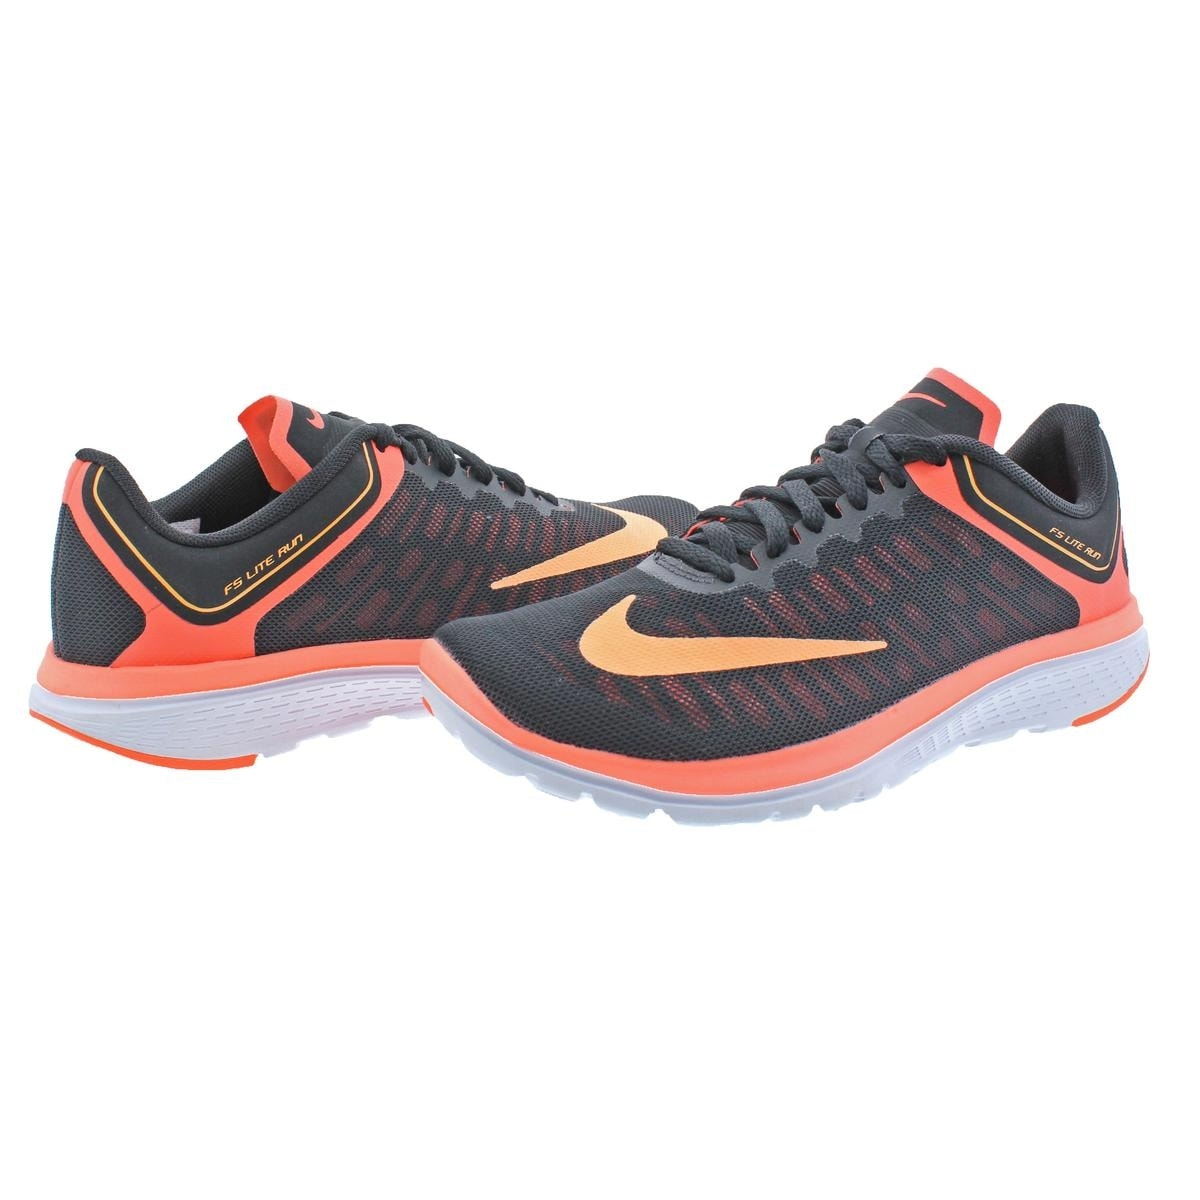 cbd444b8f497 Shop Nike Womens FS Lit Run 4 Running Shoes Fitsole Fitness - Ships To  Canada - Overstock - 22118786